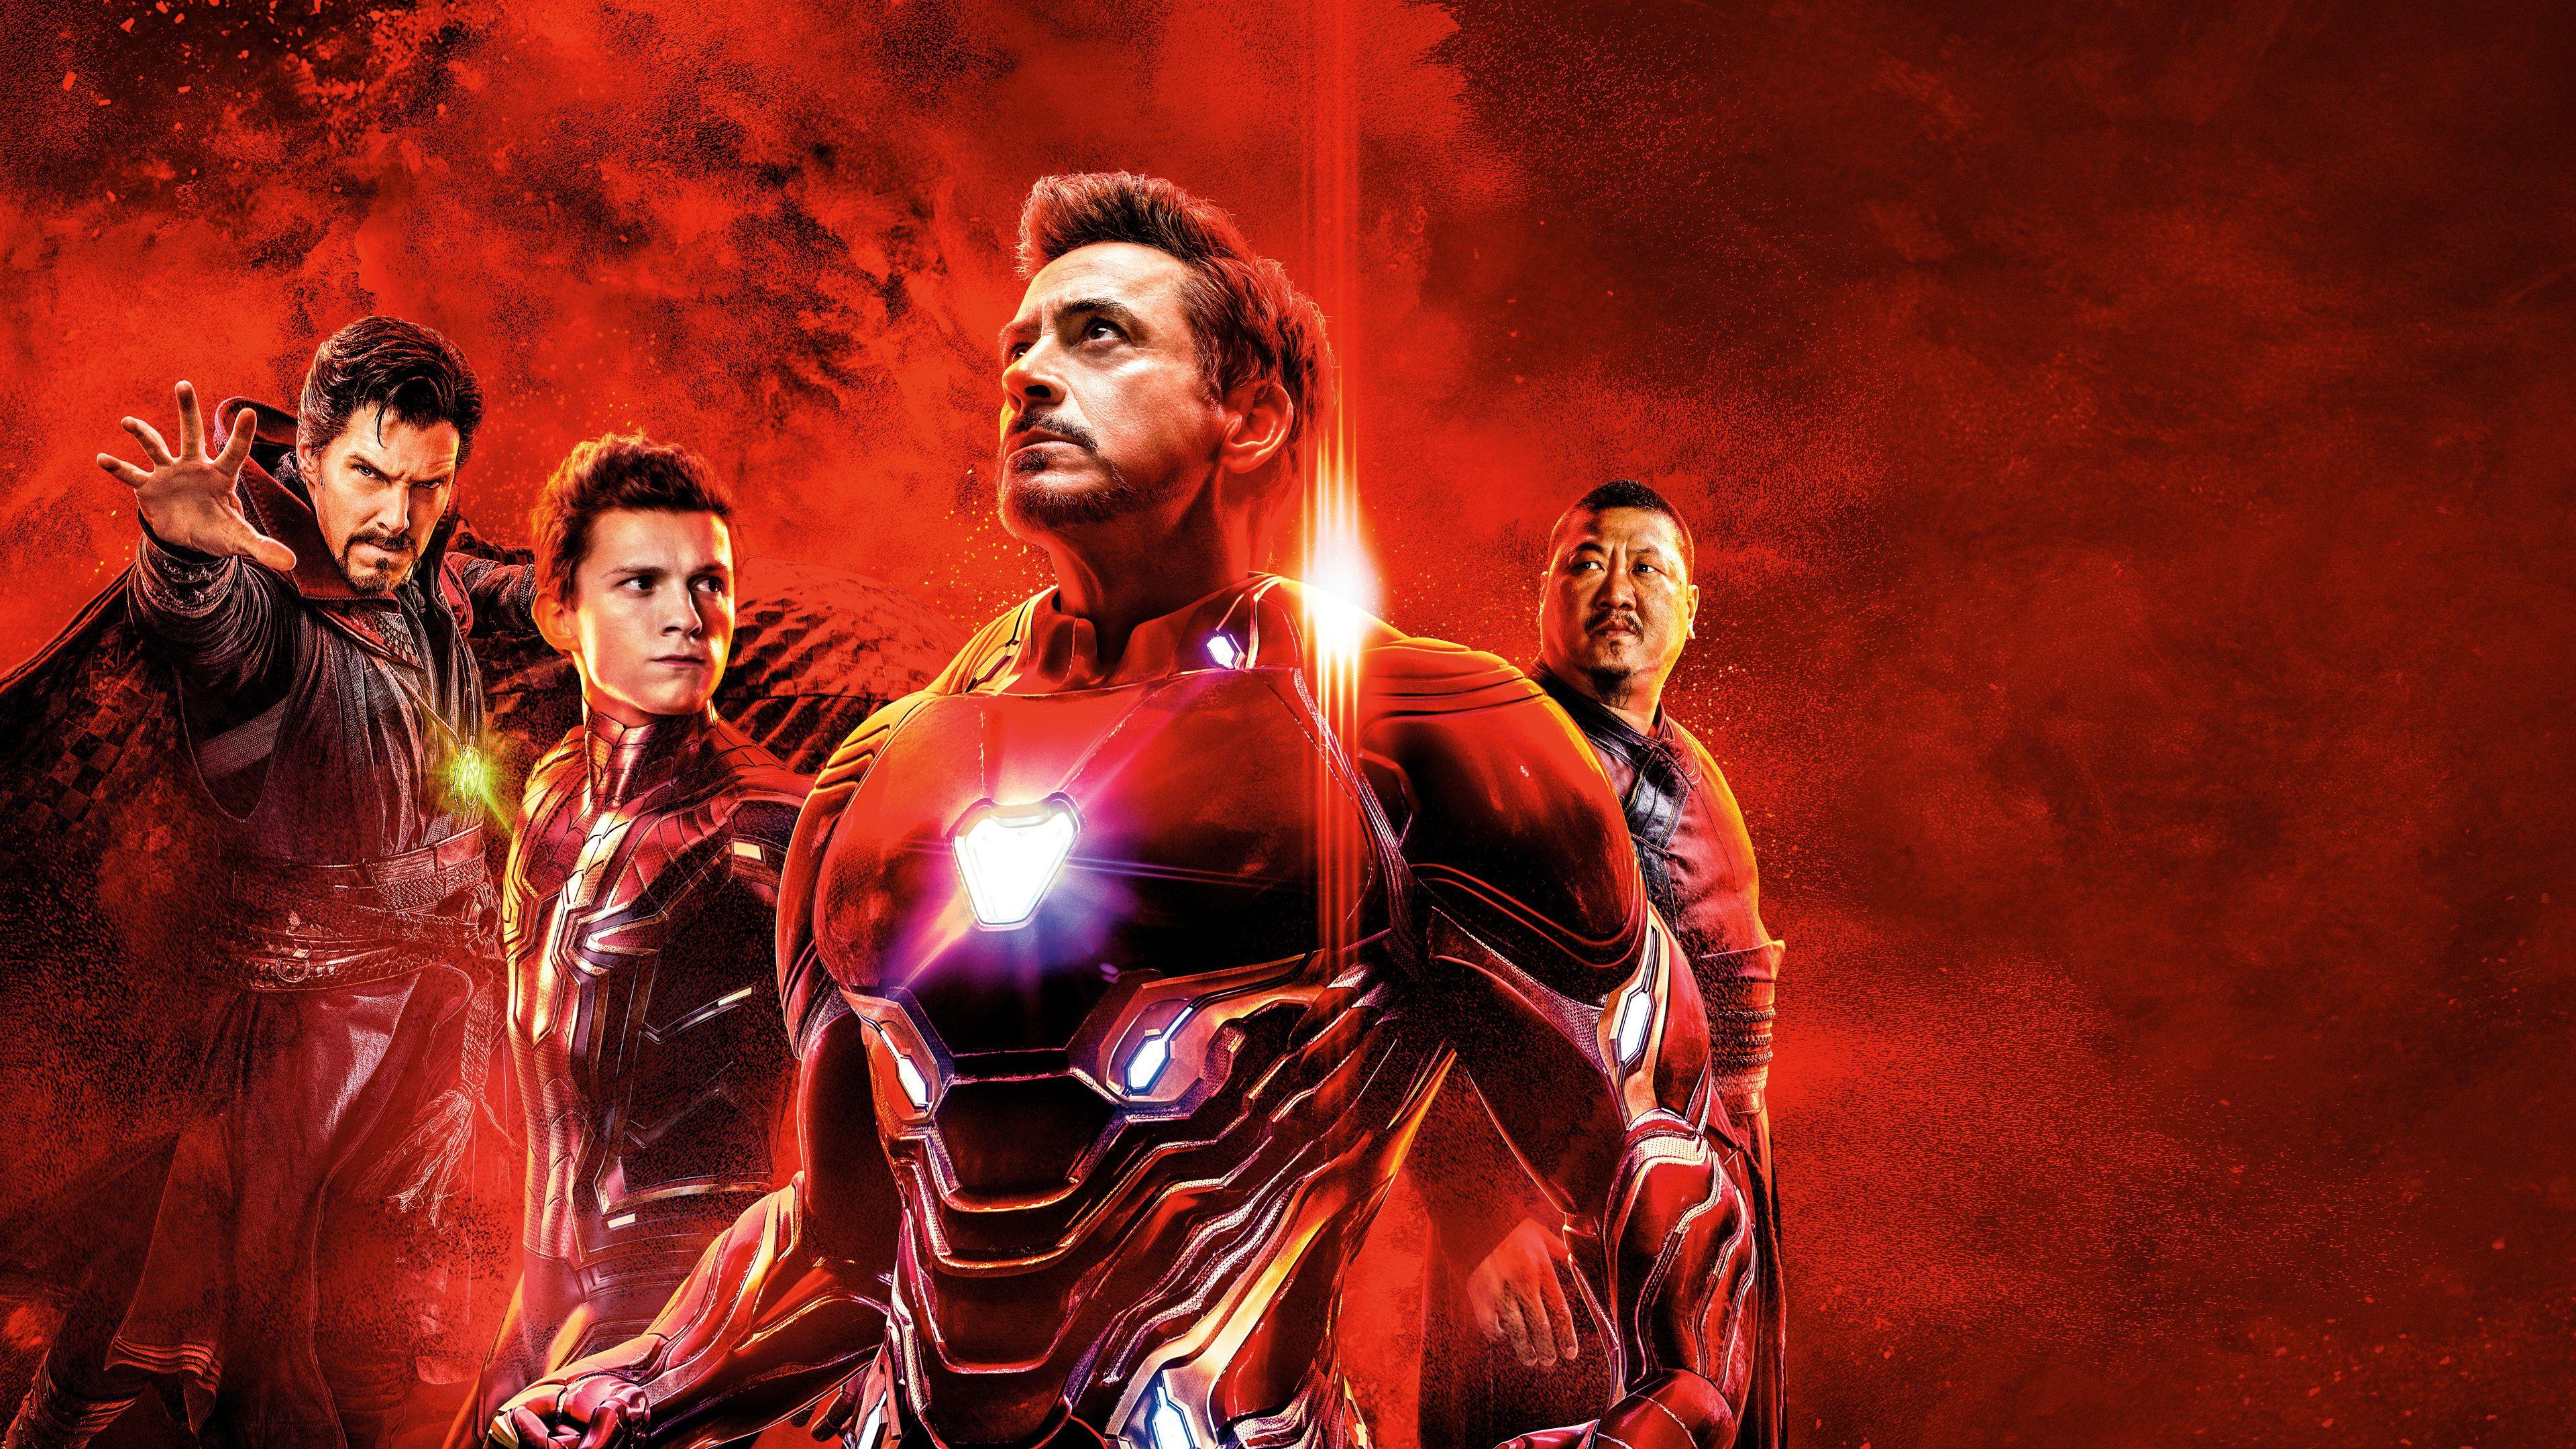 Avengers Infinity War Reality Stone Poster 4k spiderman